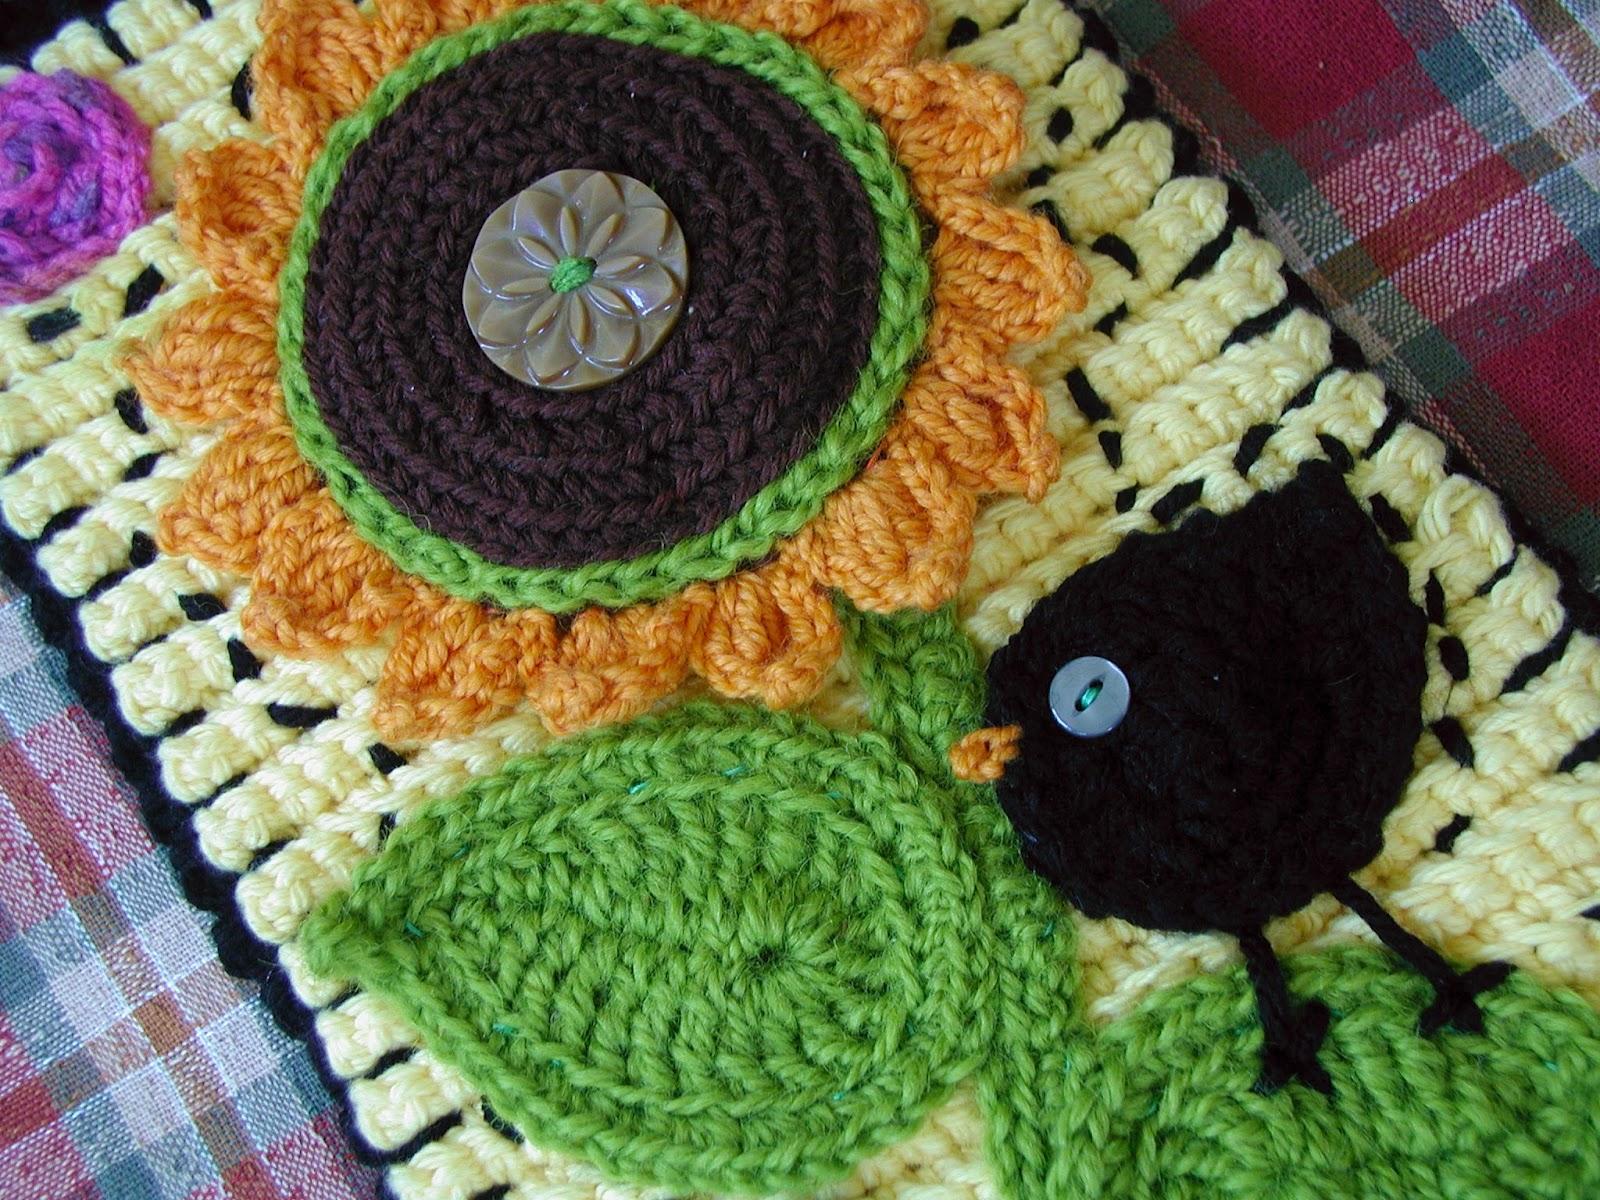 My crochet вязание крючком